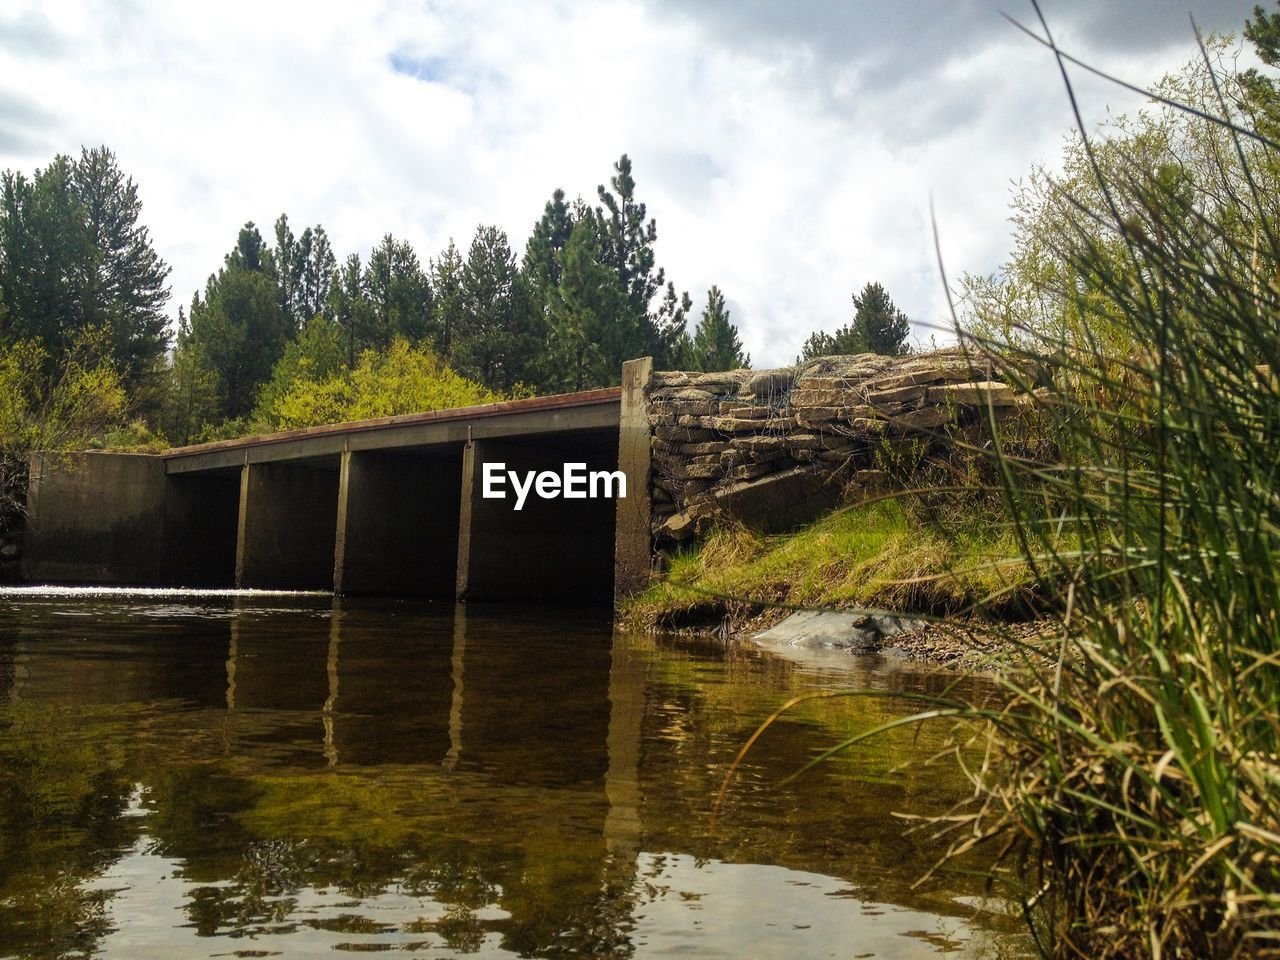 Bridge Passing Through River In Forest